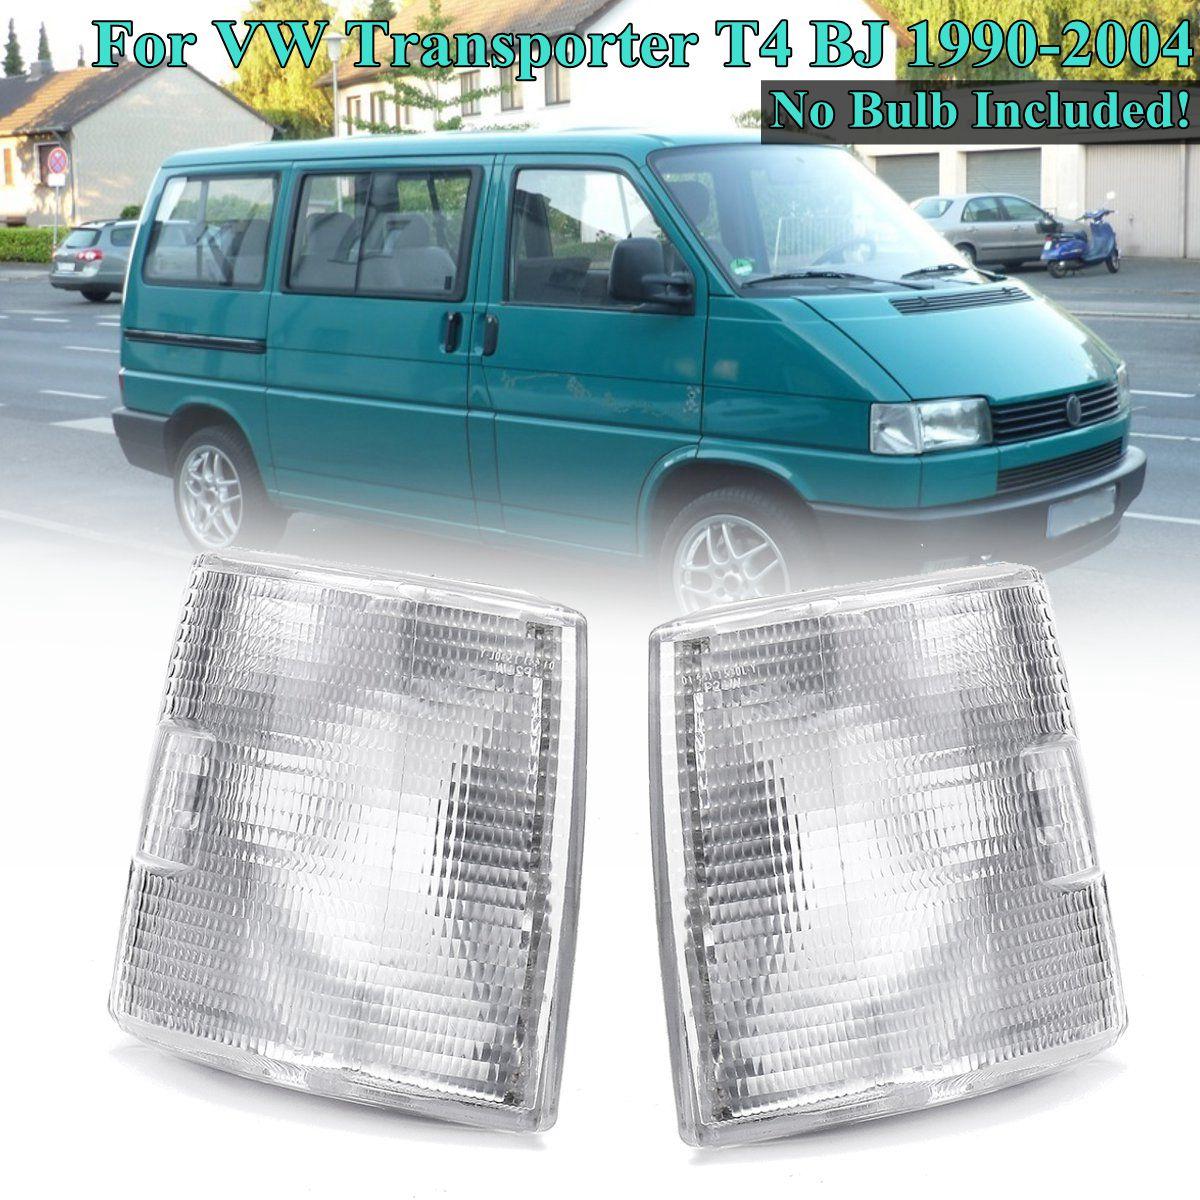 1 Pair Front Corner Lights Indicator Signal Lamps For VW Transporter T4 1990 1991 1992 1993 1994 1995 1996 1997 1998 1999~2004